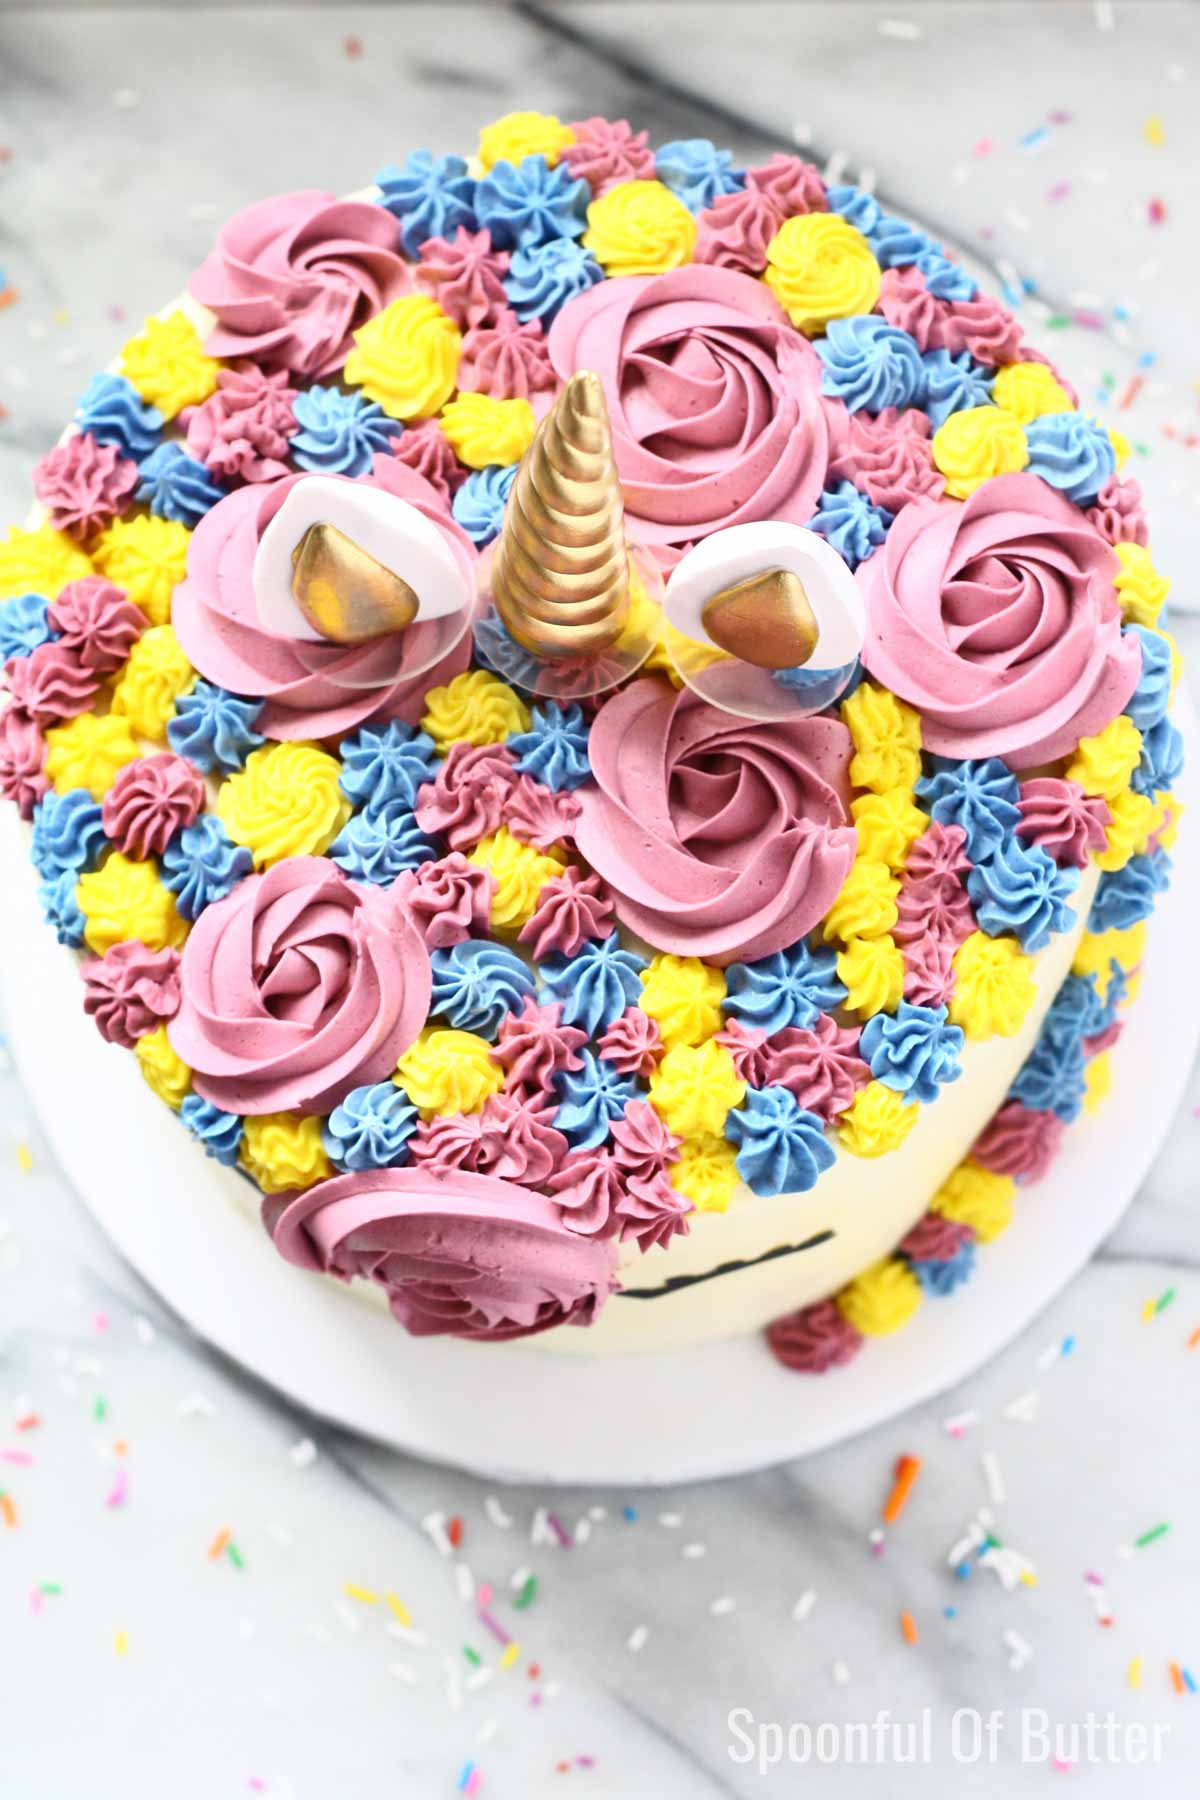 DIY Birthday Unicorn Cake 4 - an easy way to make unicorn birthday cake.